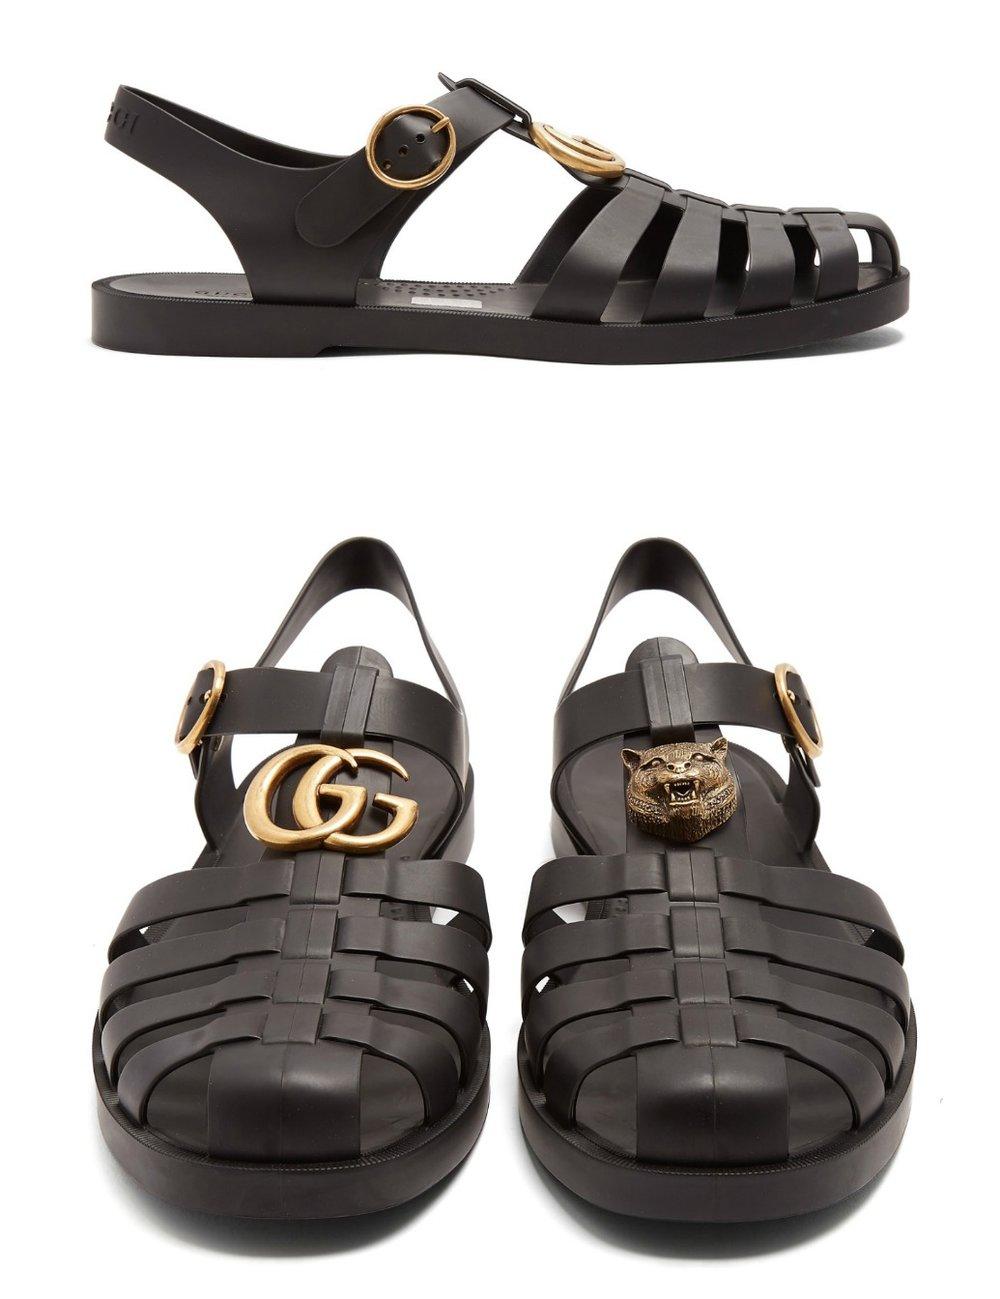 GUCCICaged GG-logo rubber sandals - MATCHESFASHION.COM